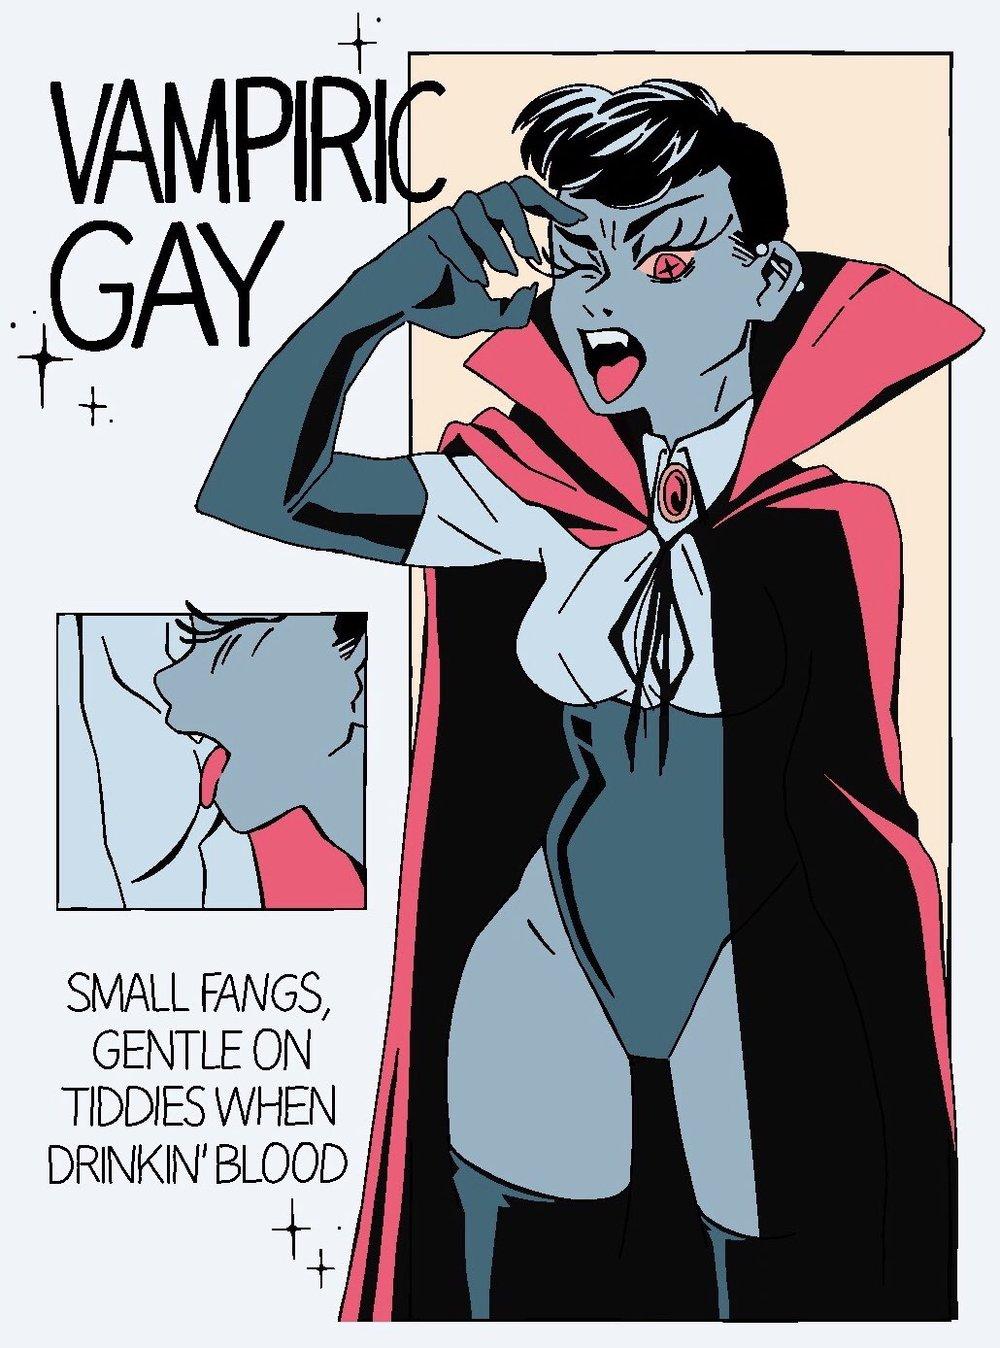 Vampiric Gay